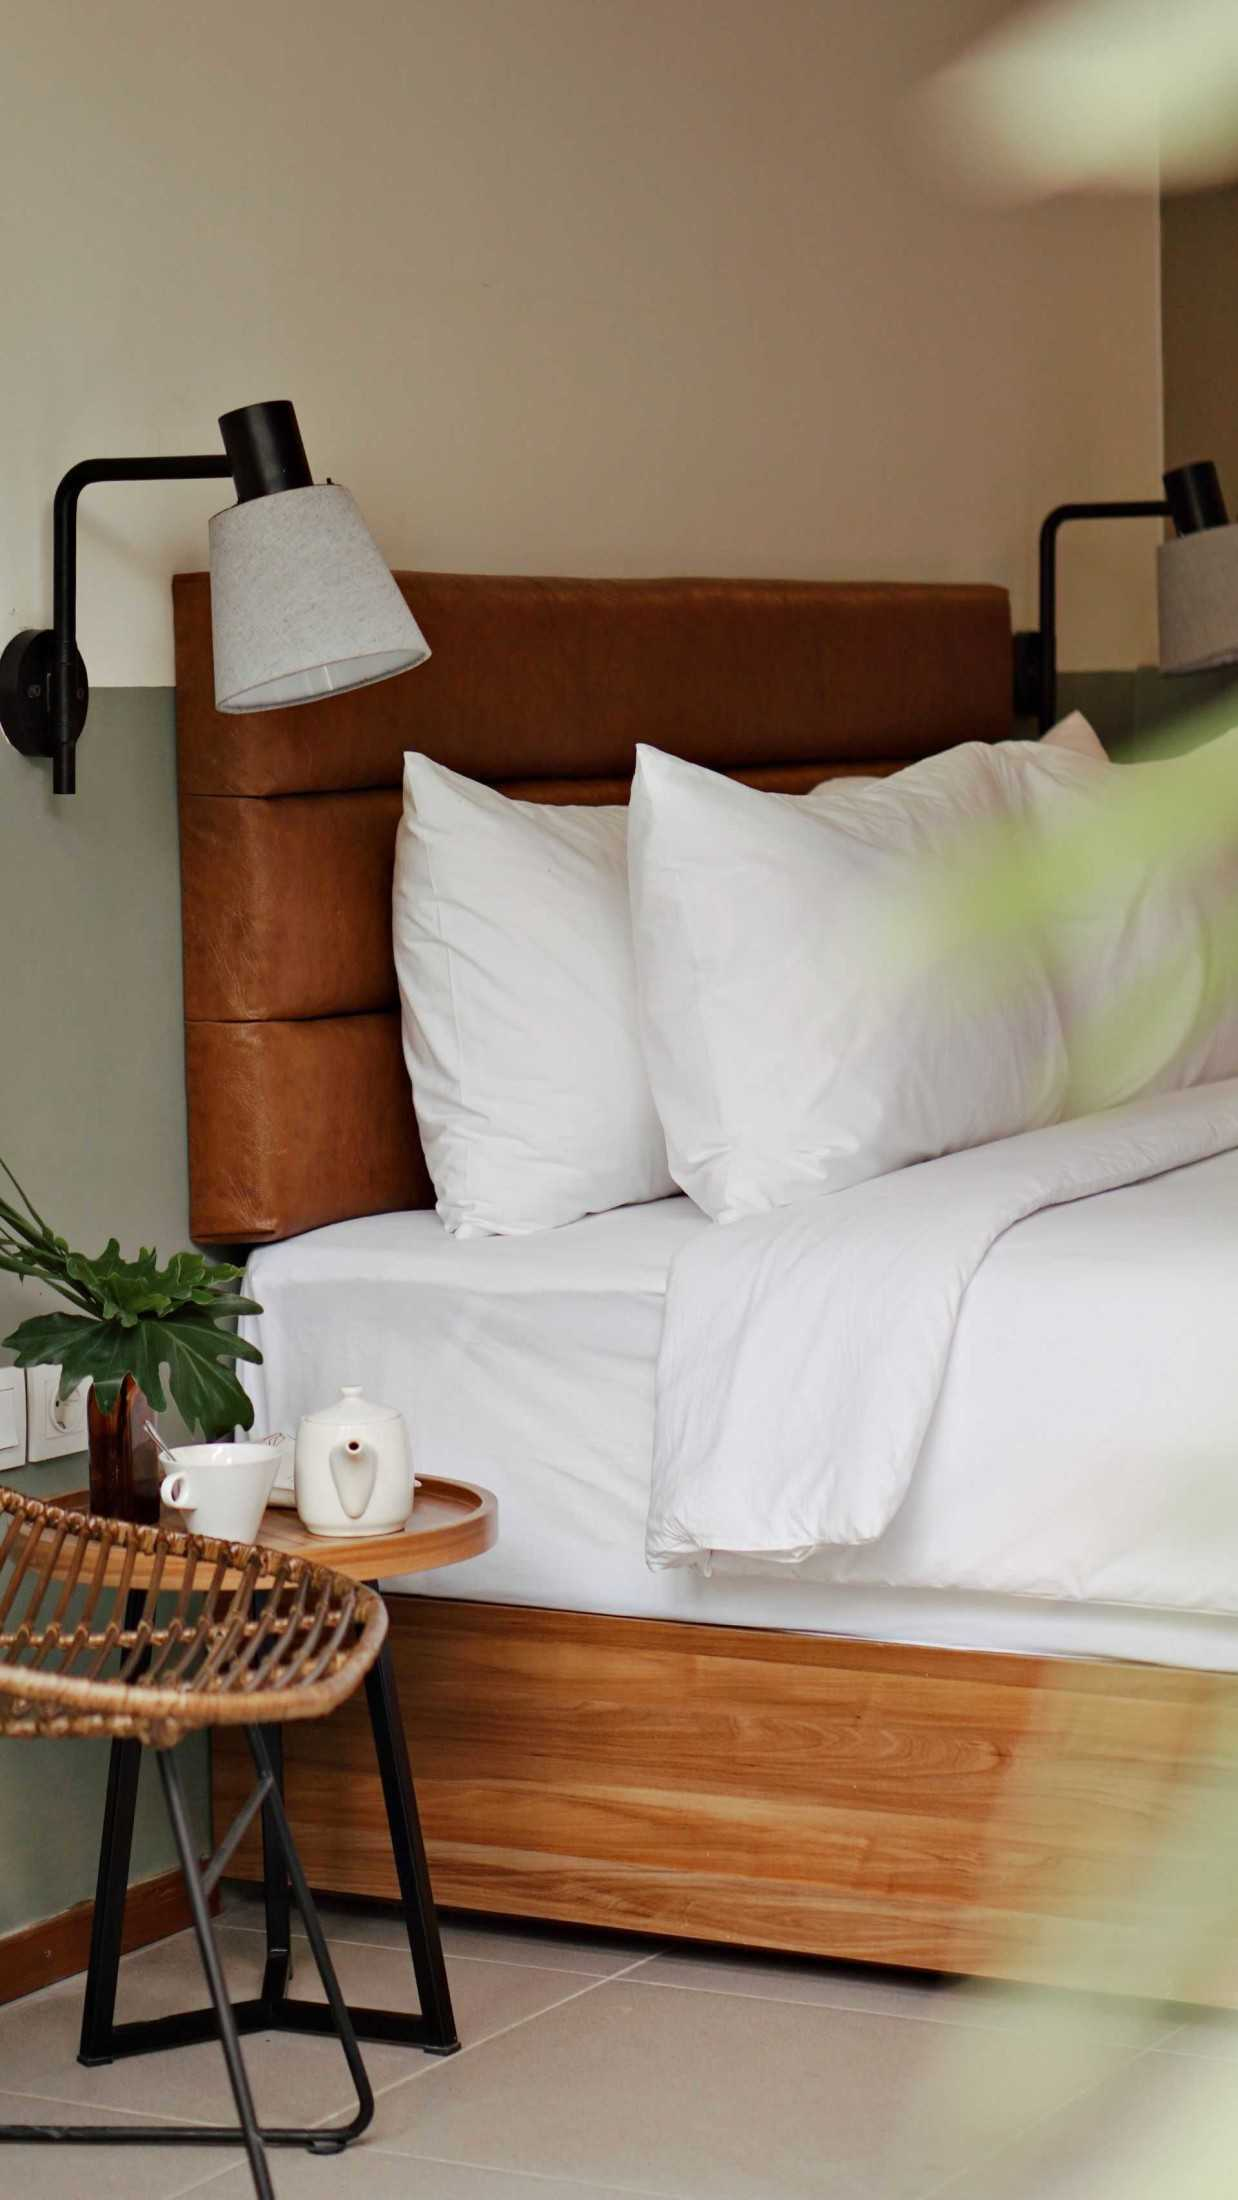 Nitkala Arsitek Rimbun Hotel Canggu, Kec. Kuta Utara, Kabupaten Badung, Bali, Indonesia Canggu, Kec. Kuta Utara, Kabupaten Badung, Bali, Indonesia Nitkala-Arsitek-Rimbun-Hotel  121604